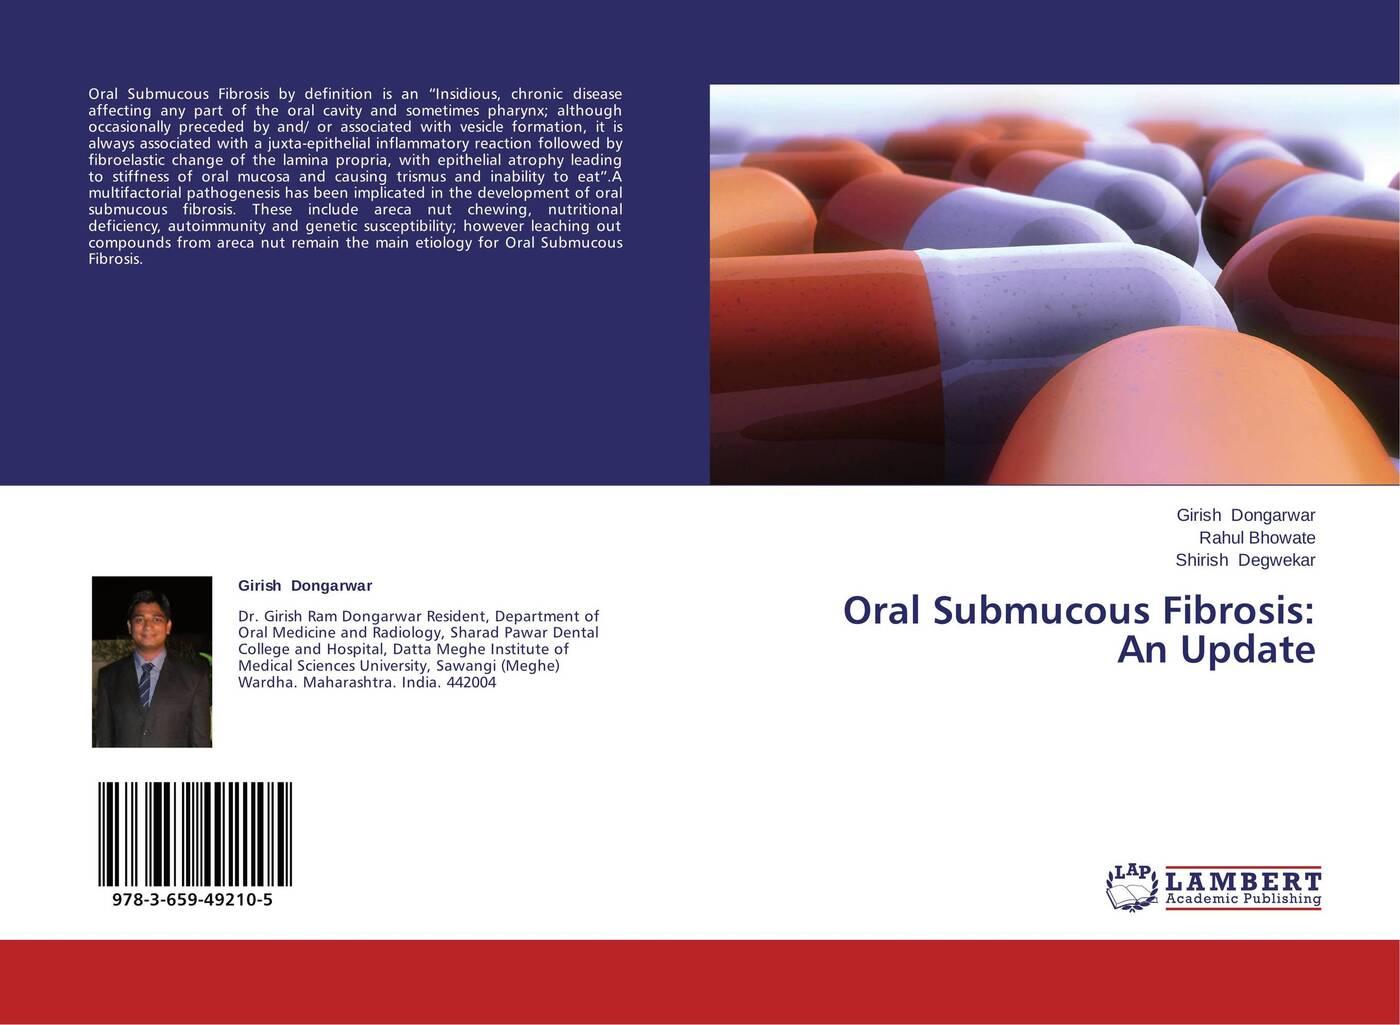 Girish Dongarwar,Rahul Bhowate and Shirish Degwekar Oral Submucous Fibrosis: An Update oral submucous fibrosis an update